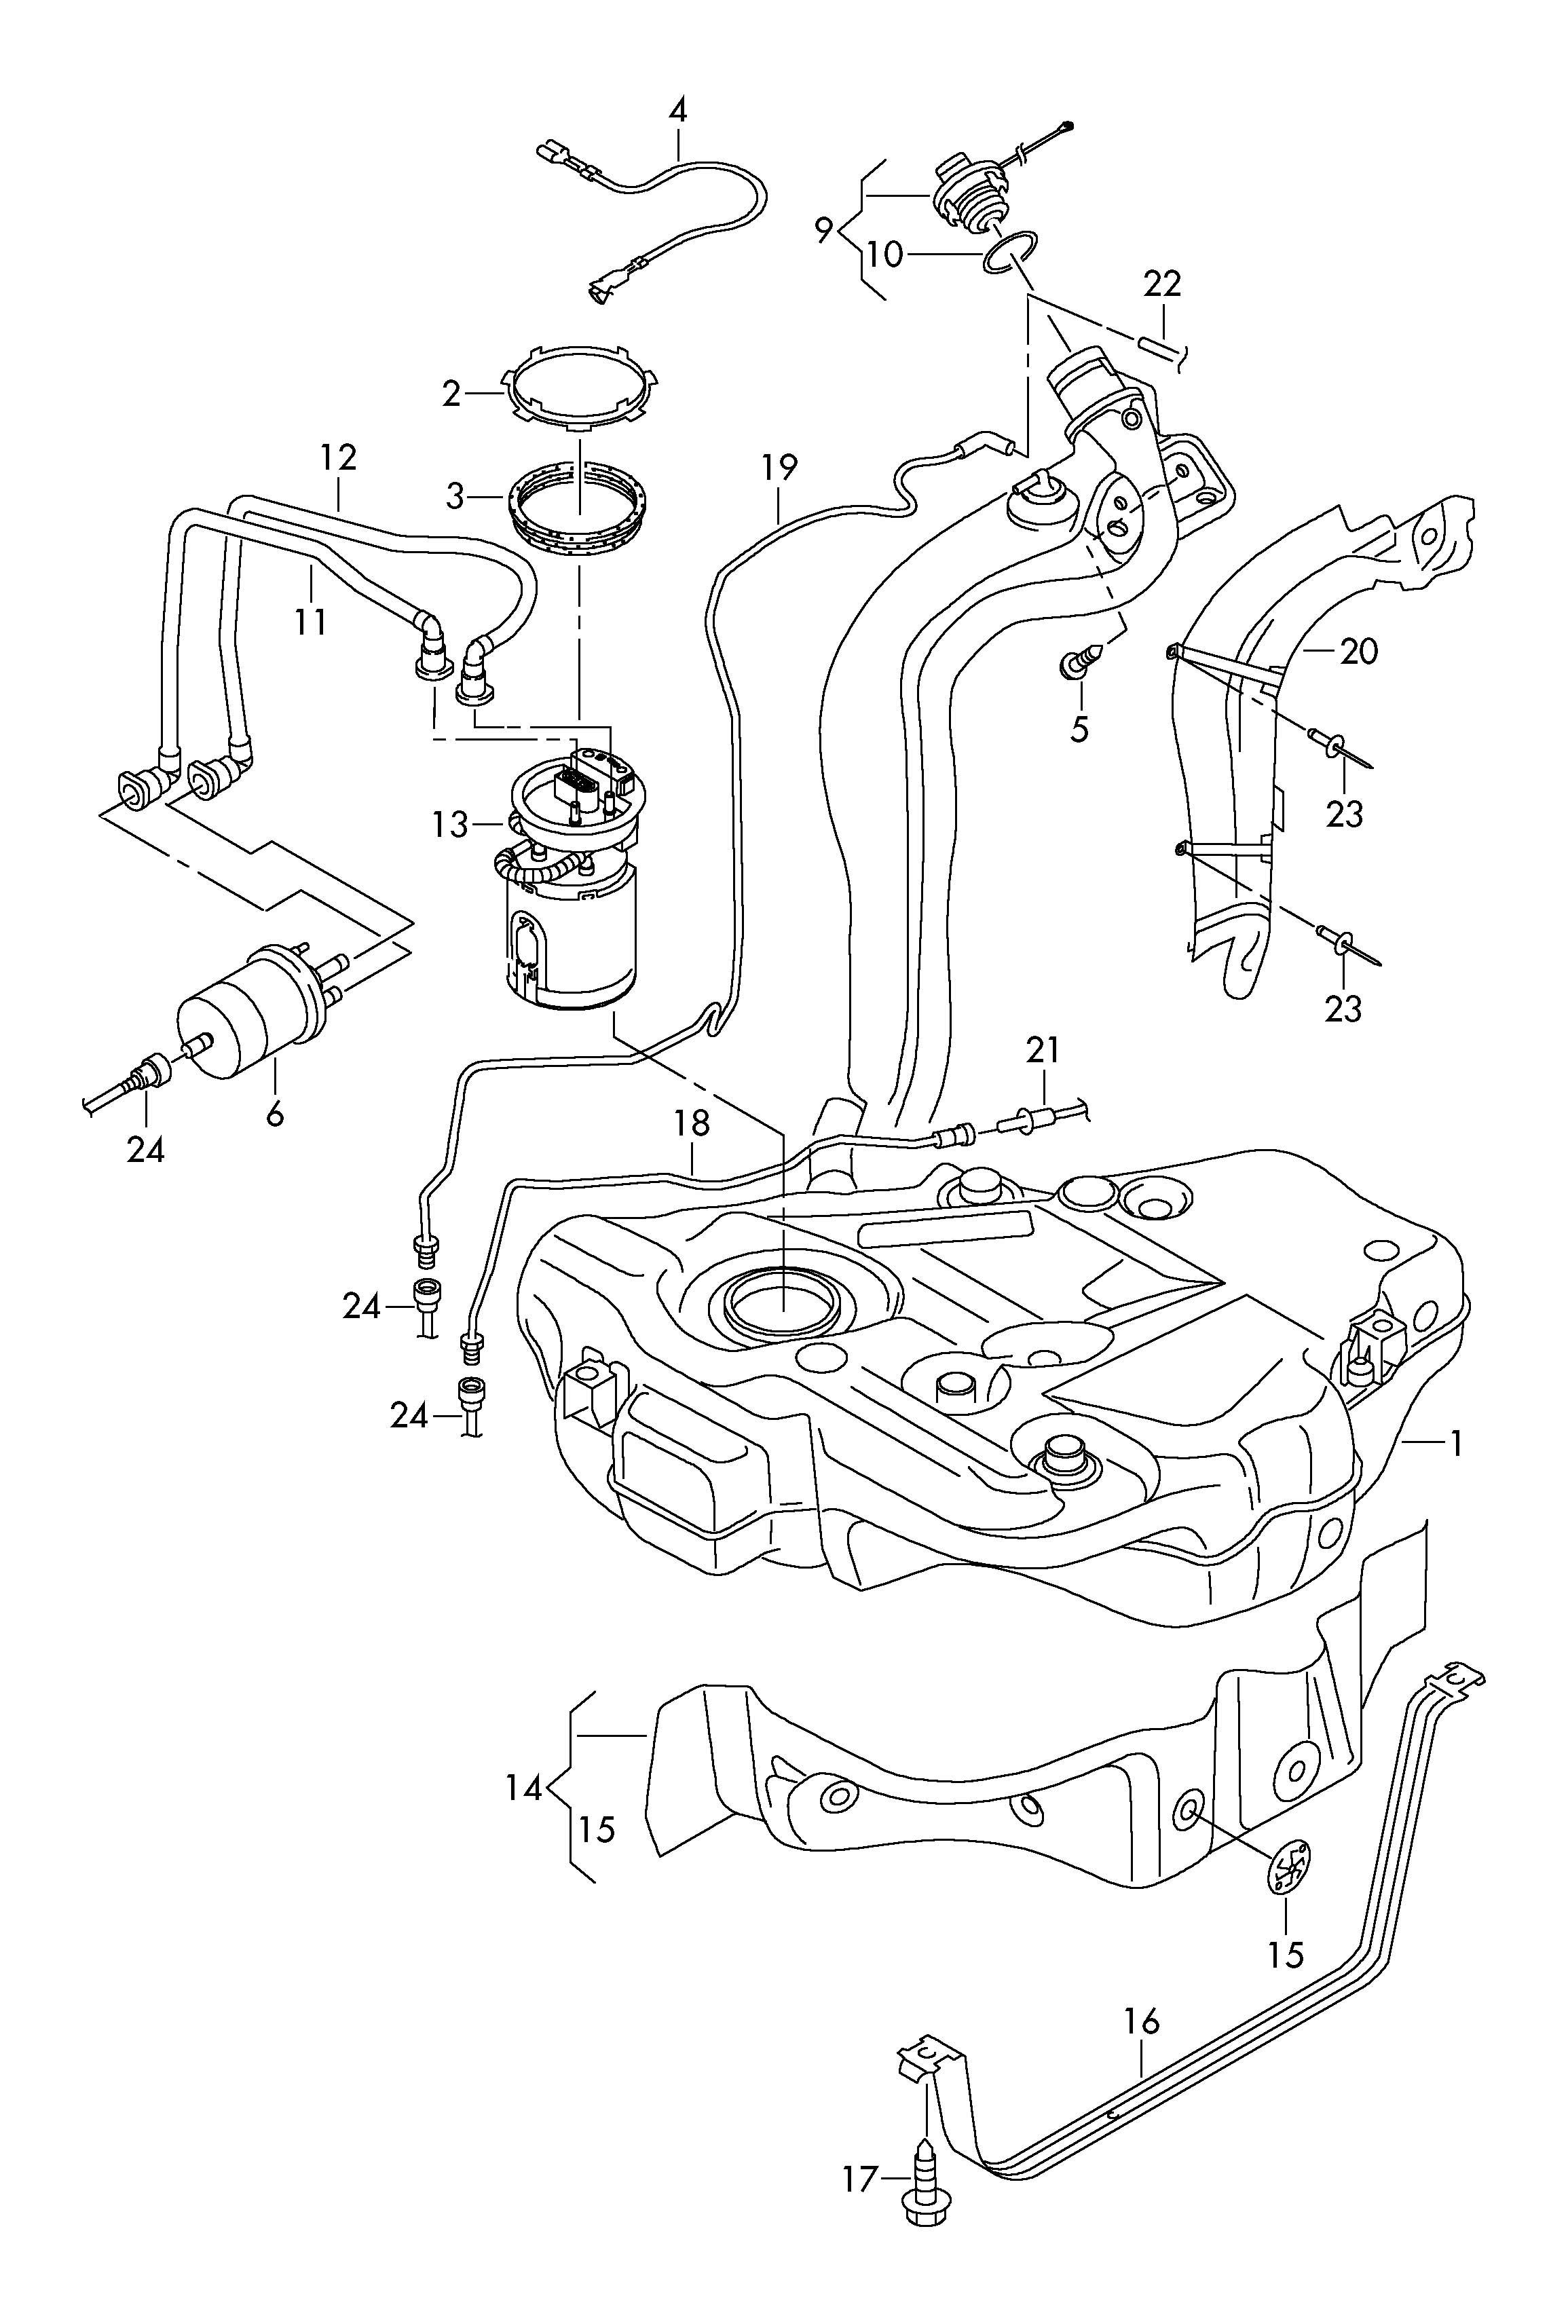 Volkswagen Golf Cap Fuel Filler With Retaining Strap